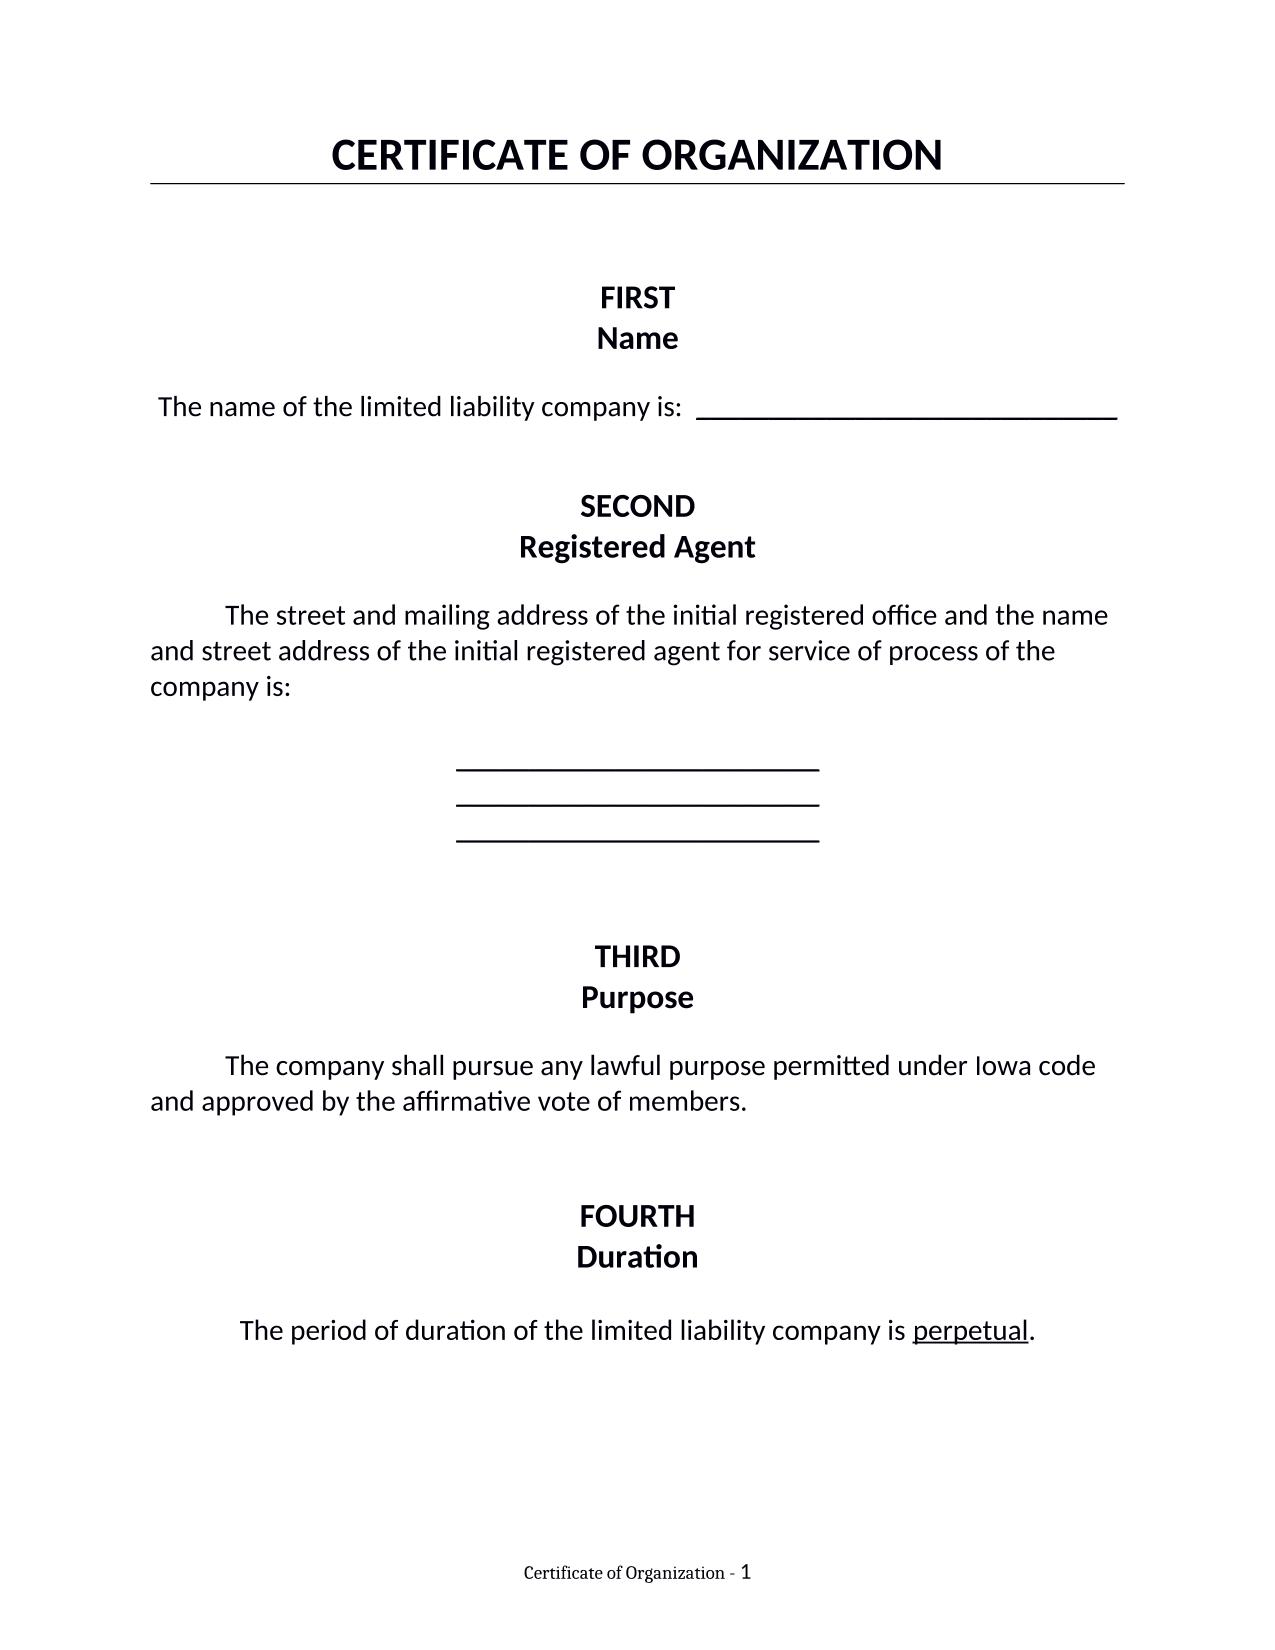 Iowa LLC Certificate of Organization